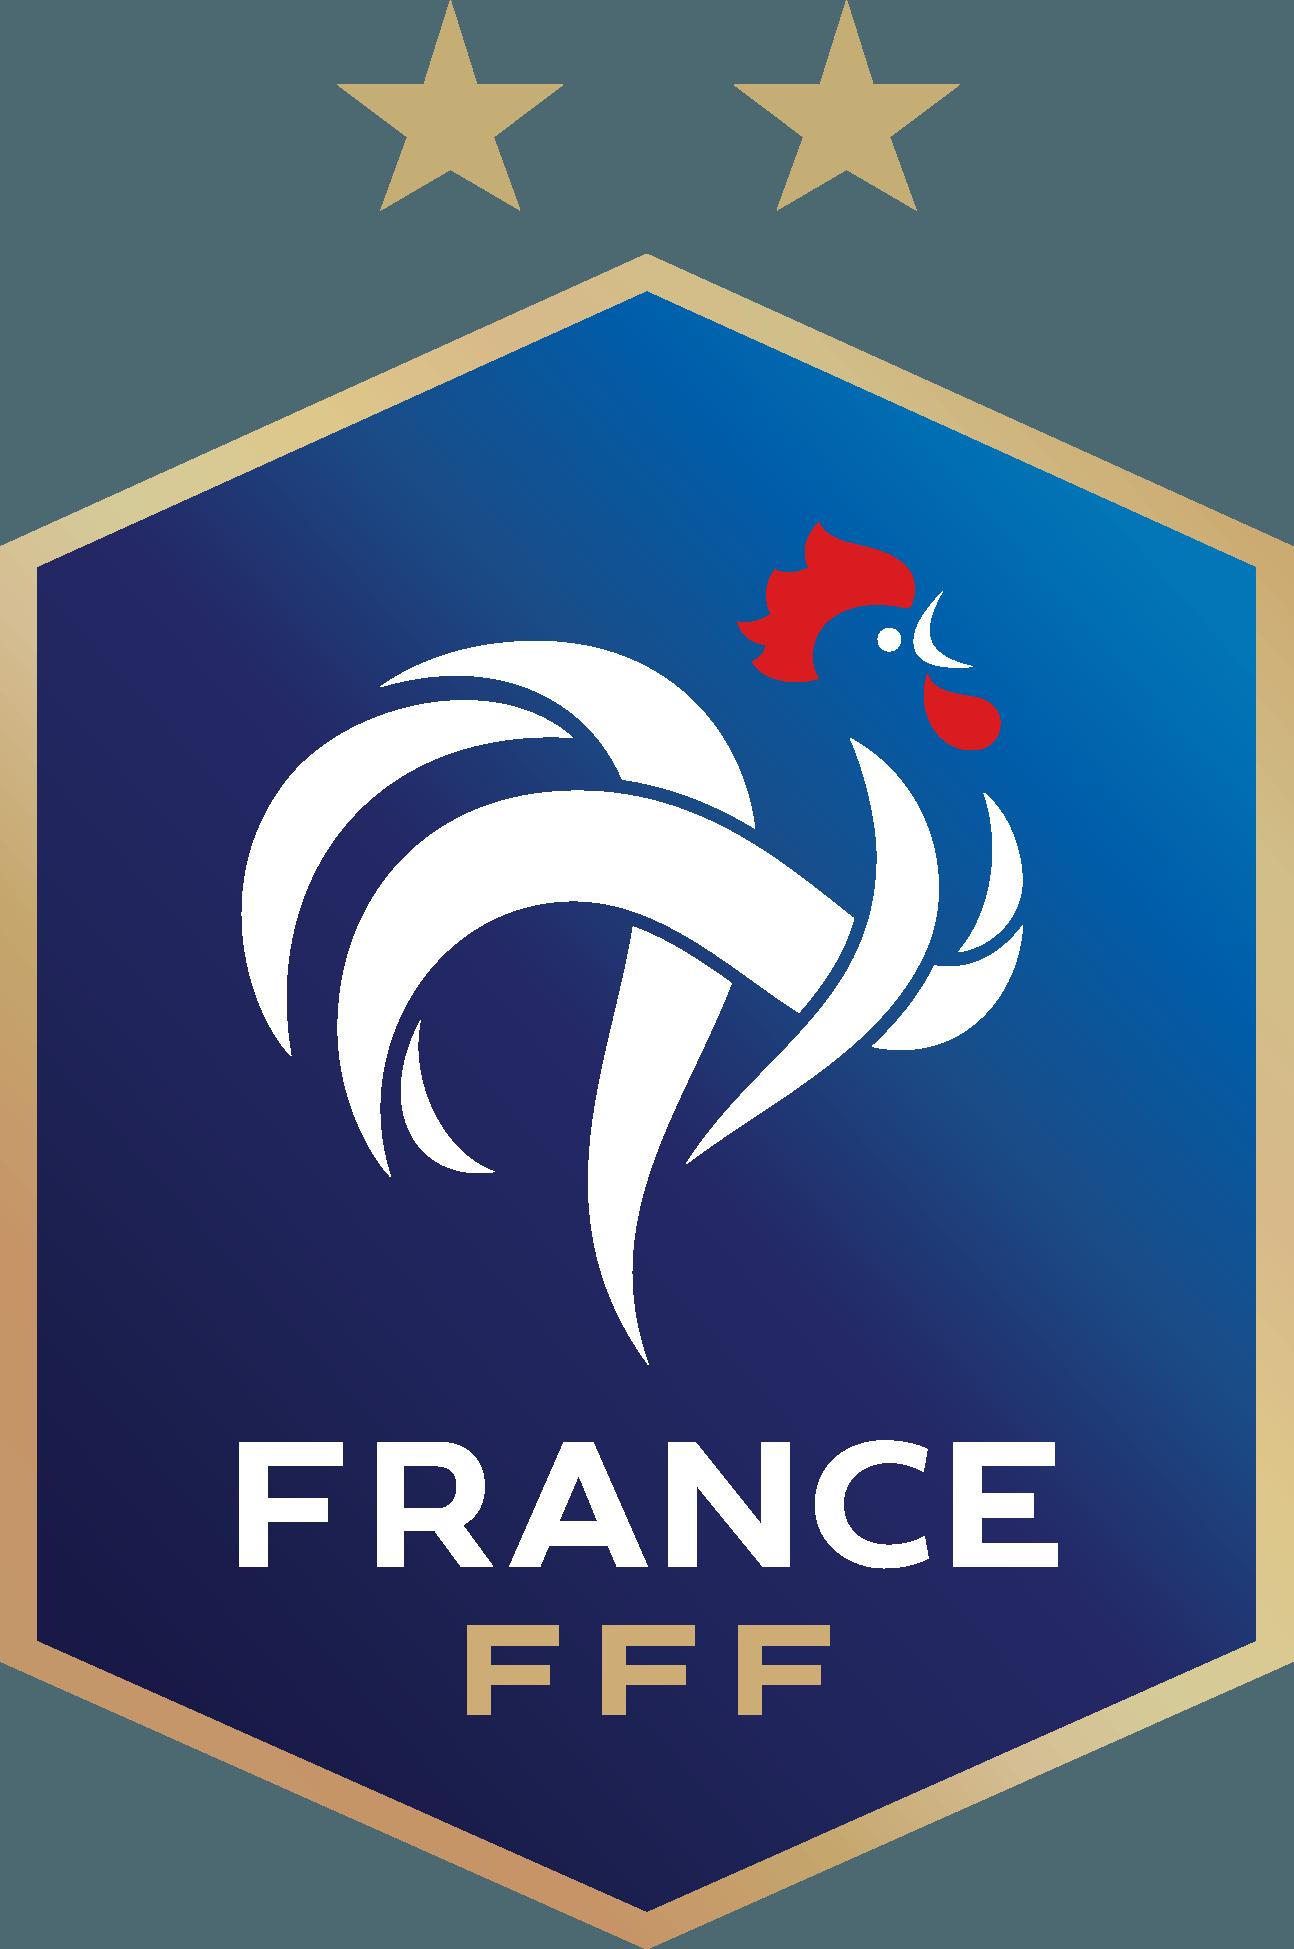 French Football Federation & France National Football Team.